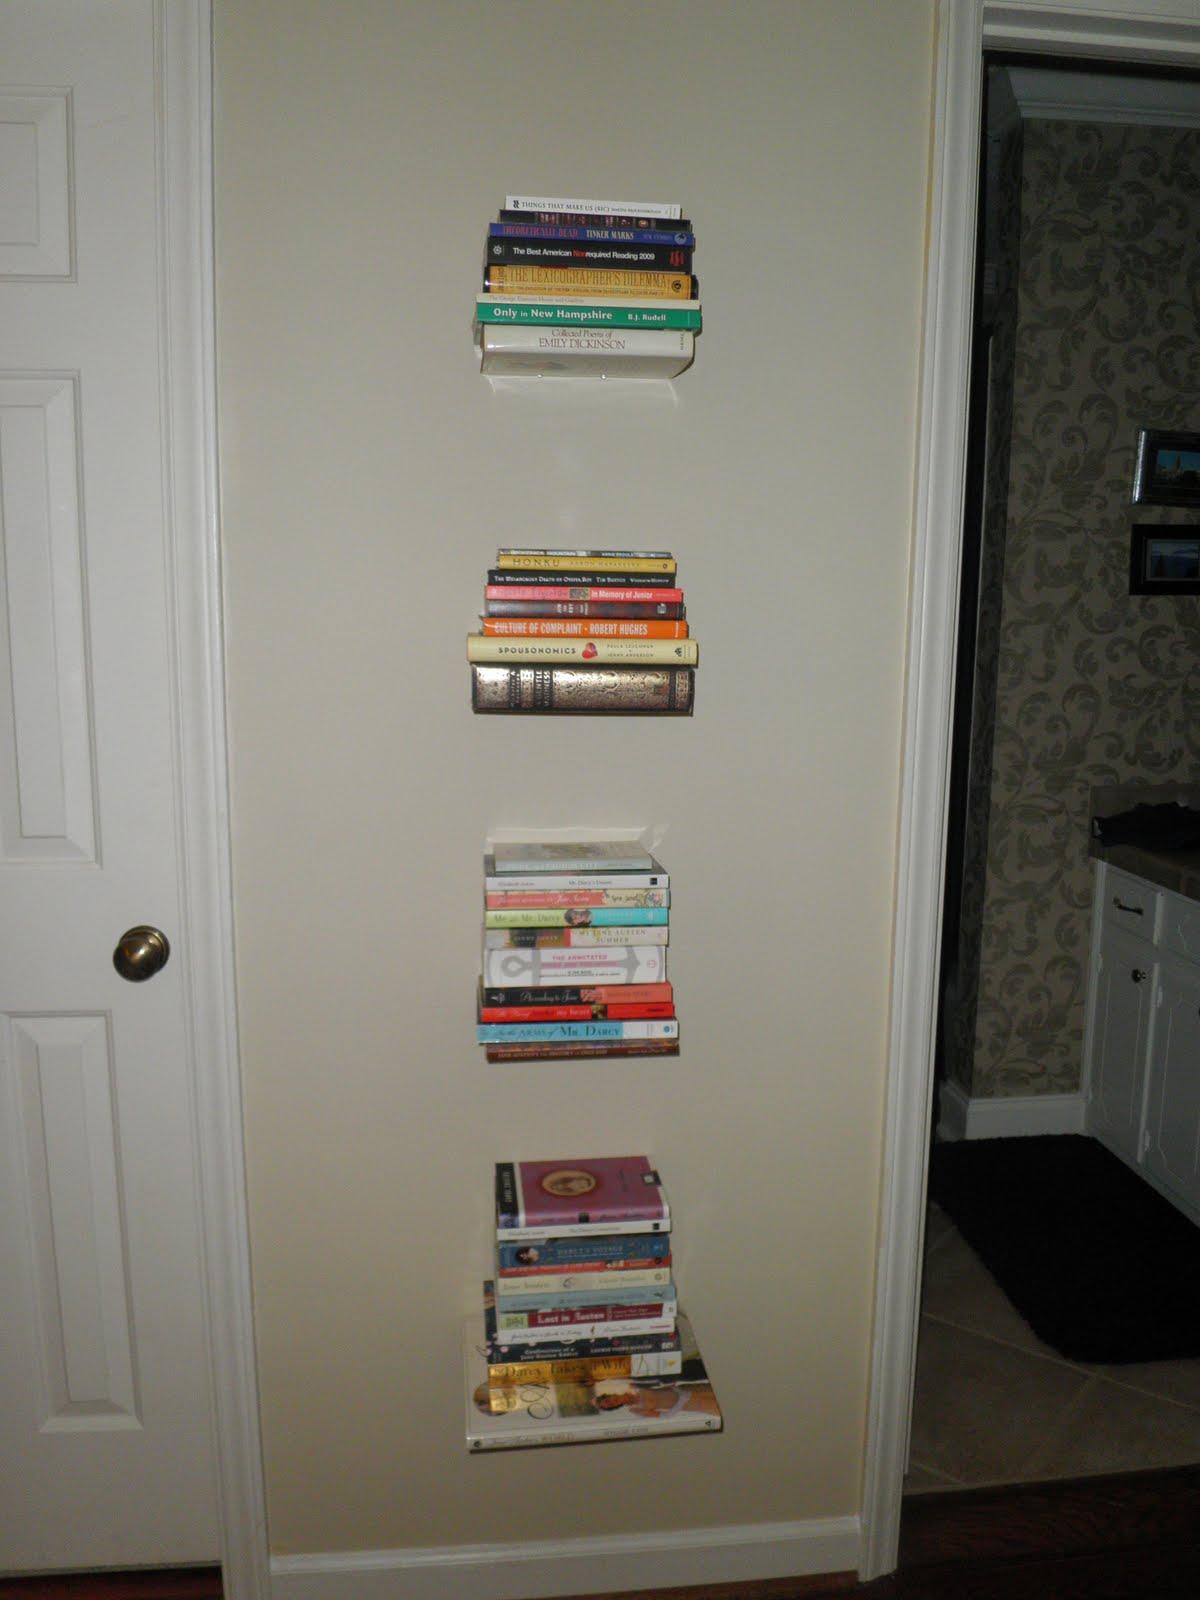 caroline bookbinder invisible bookshelves follow up